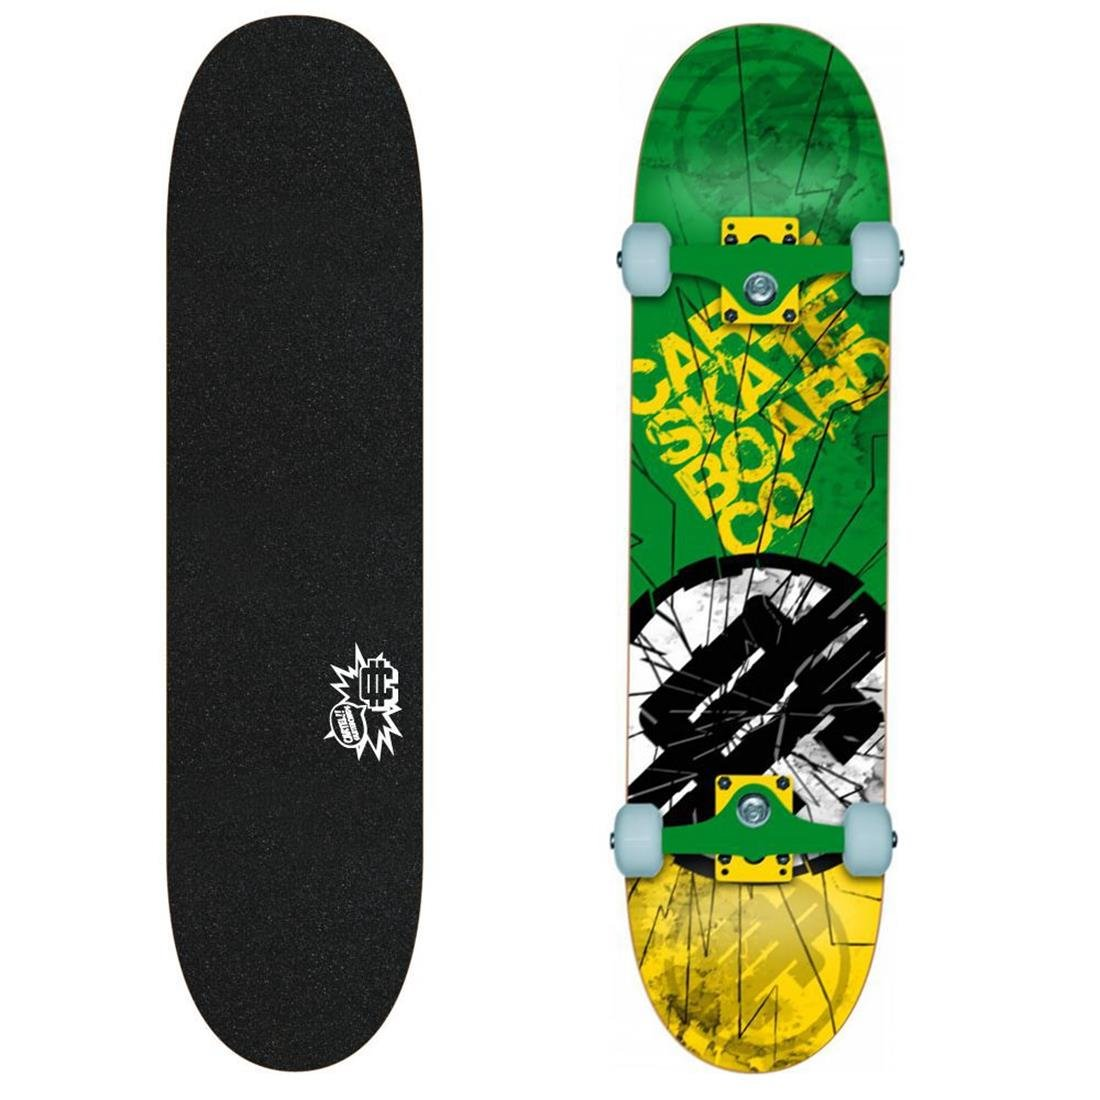 CARTEL Skateboard 7.8 Shatter Grün Yellow: Amazon.es ...